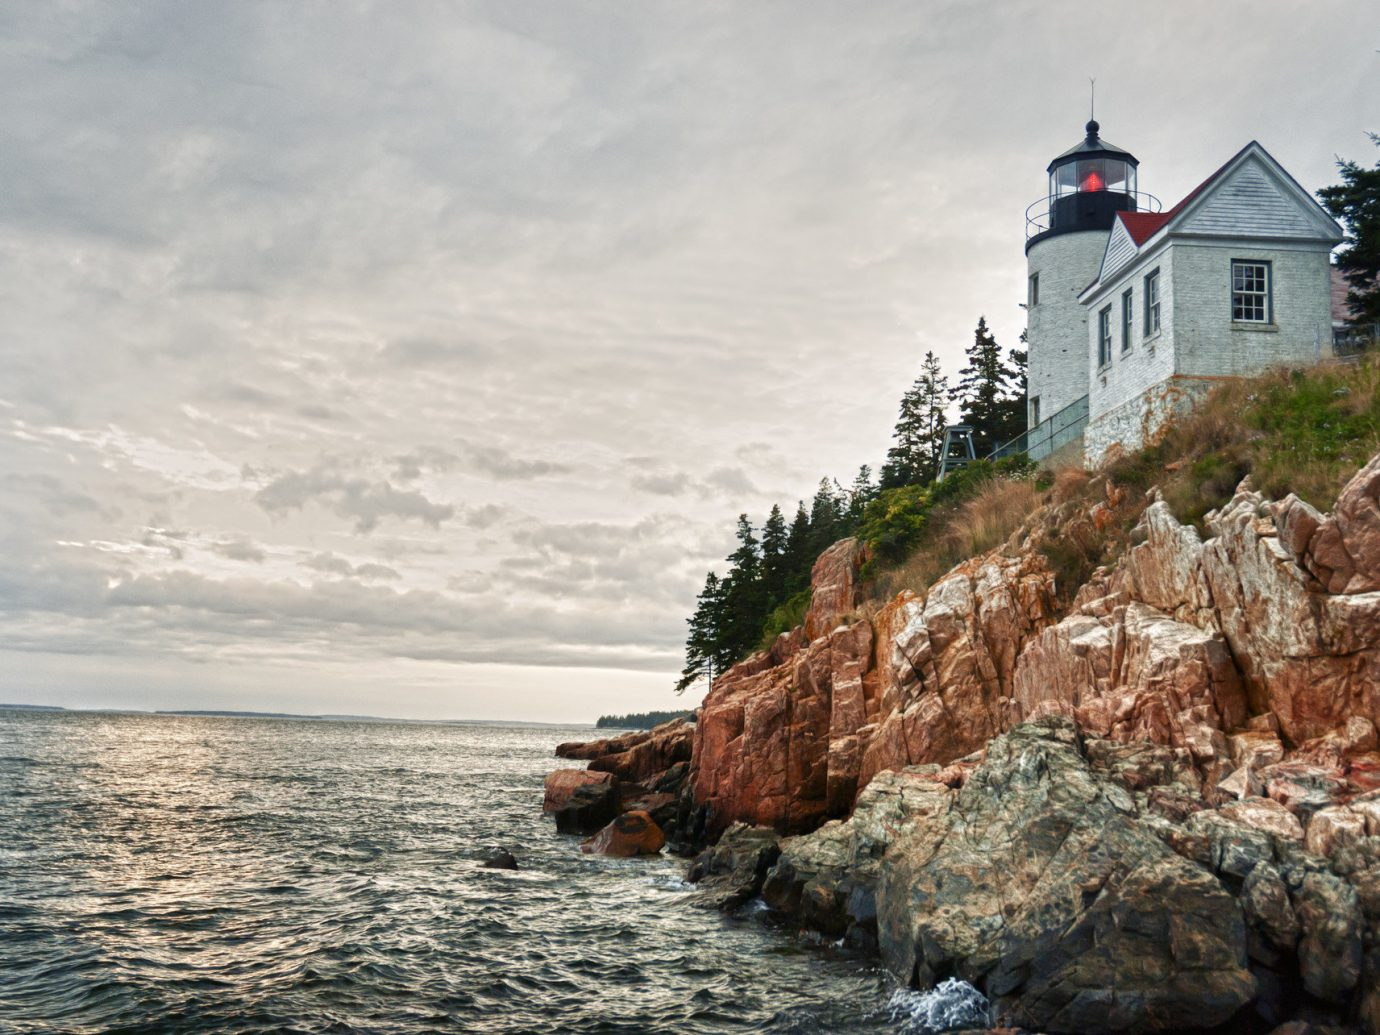 Trip Ideas rock outdoor water sky rocky Sea Coast shore tower cliff Ocean lighthouse Nature terrain cape cove bay stone hillside